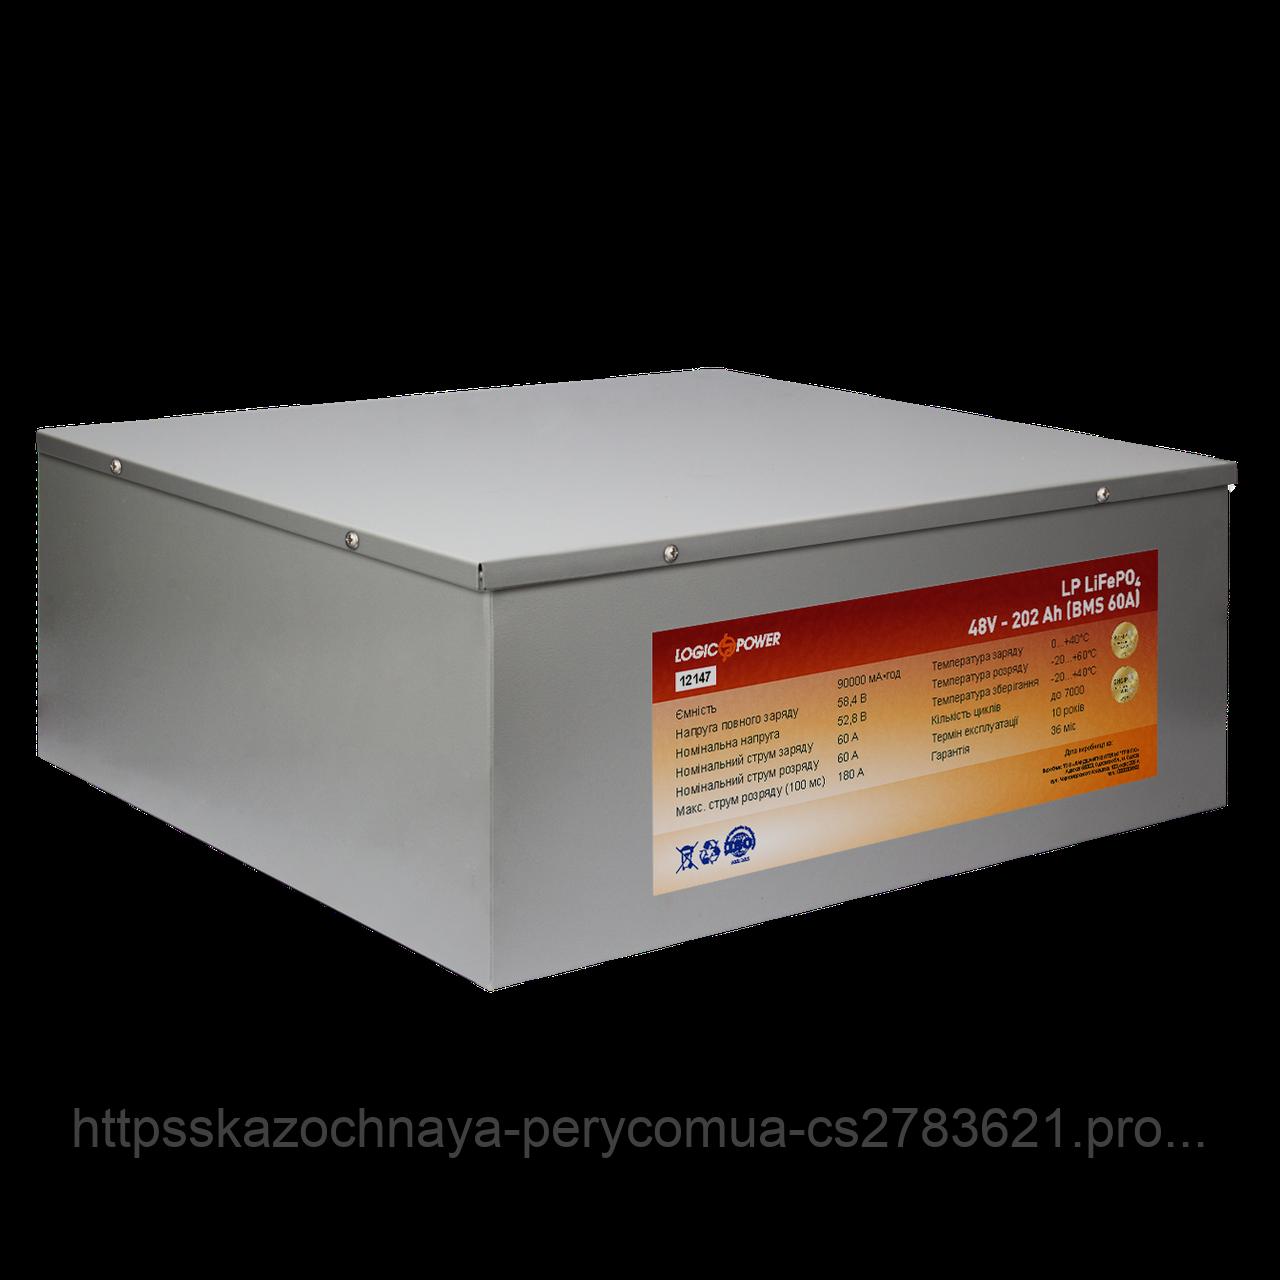 Акумулятор LP LiFePO4 48 V - 202 Ah (BMS 60A) метал